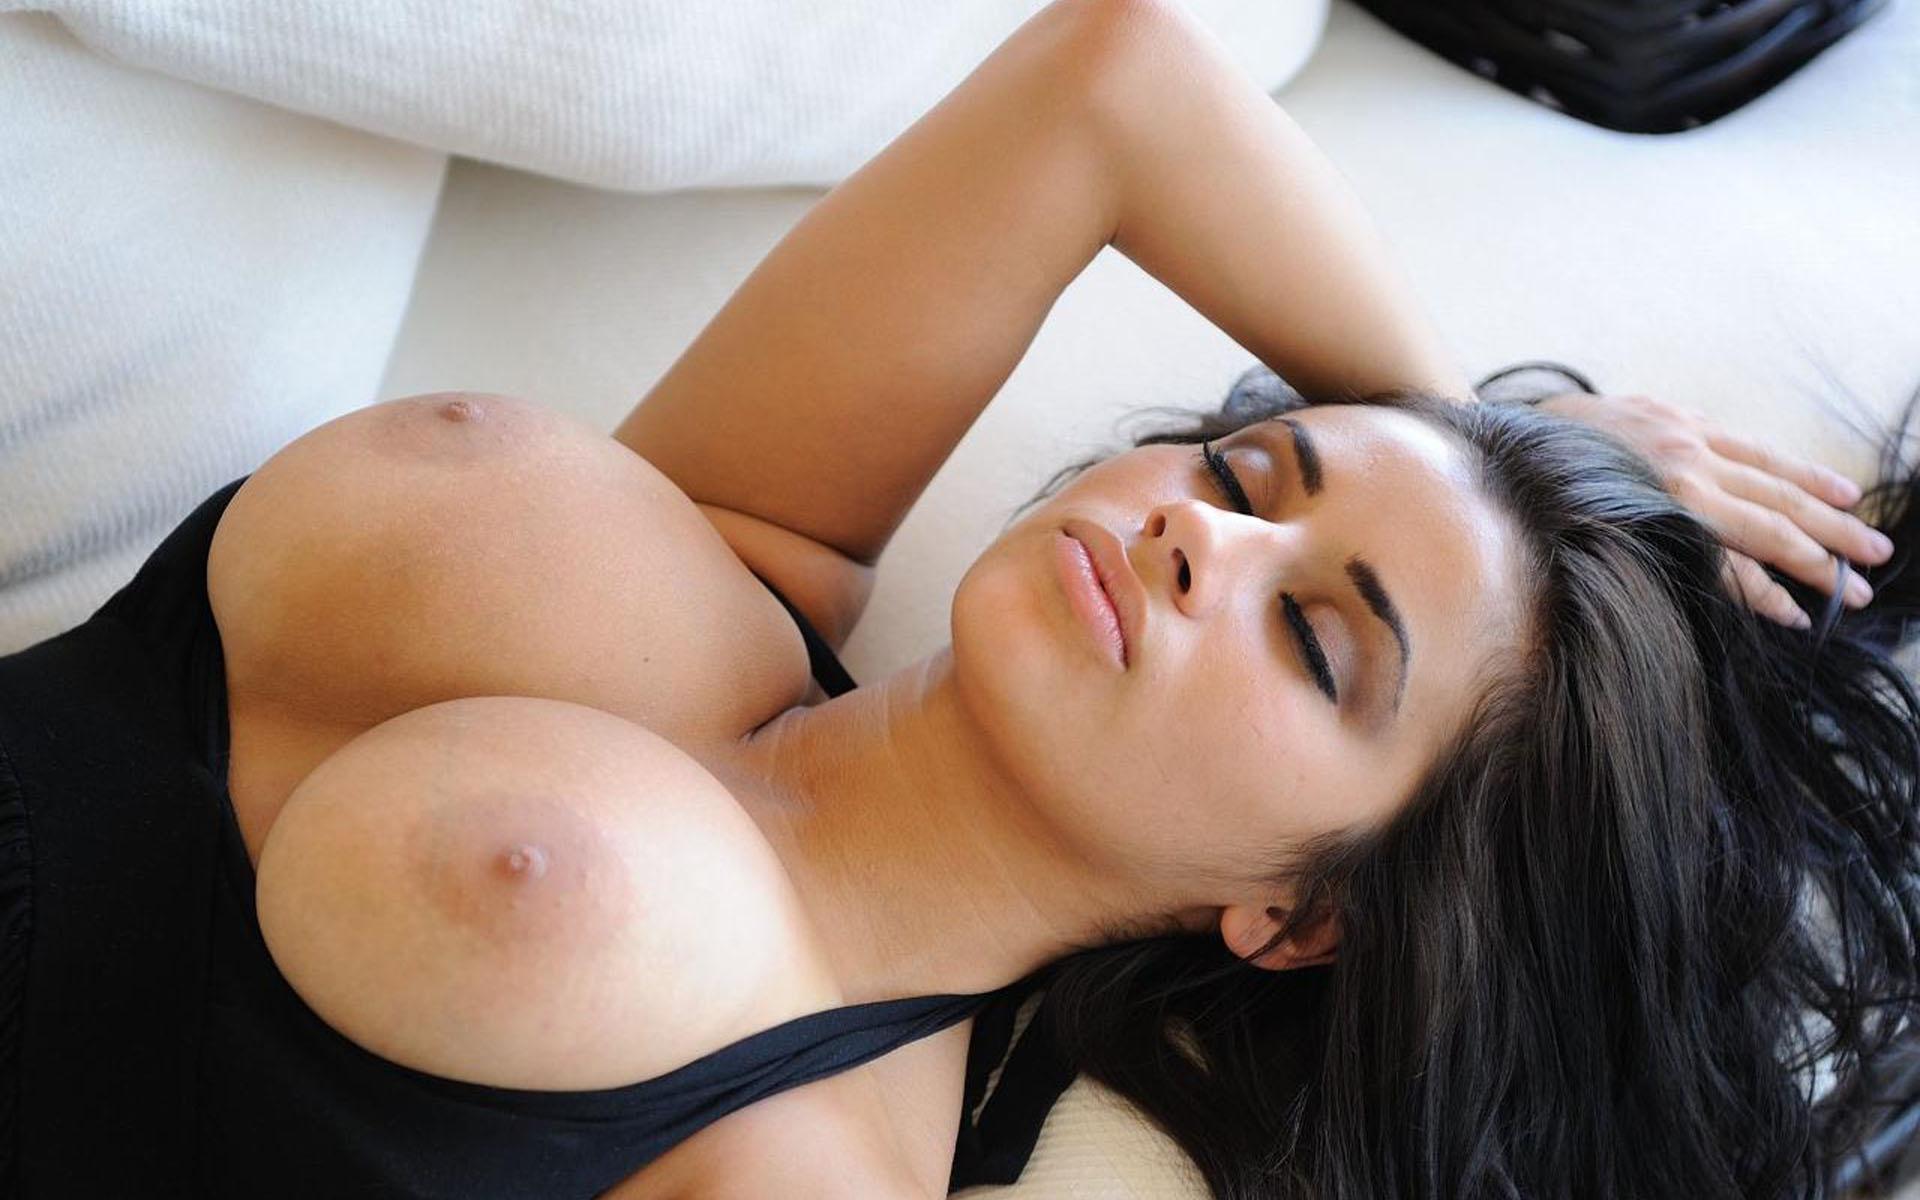 krasivie-porno-foto-s-bolshimi-siskami